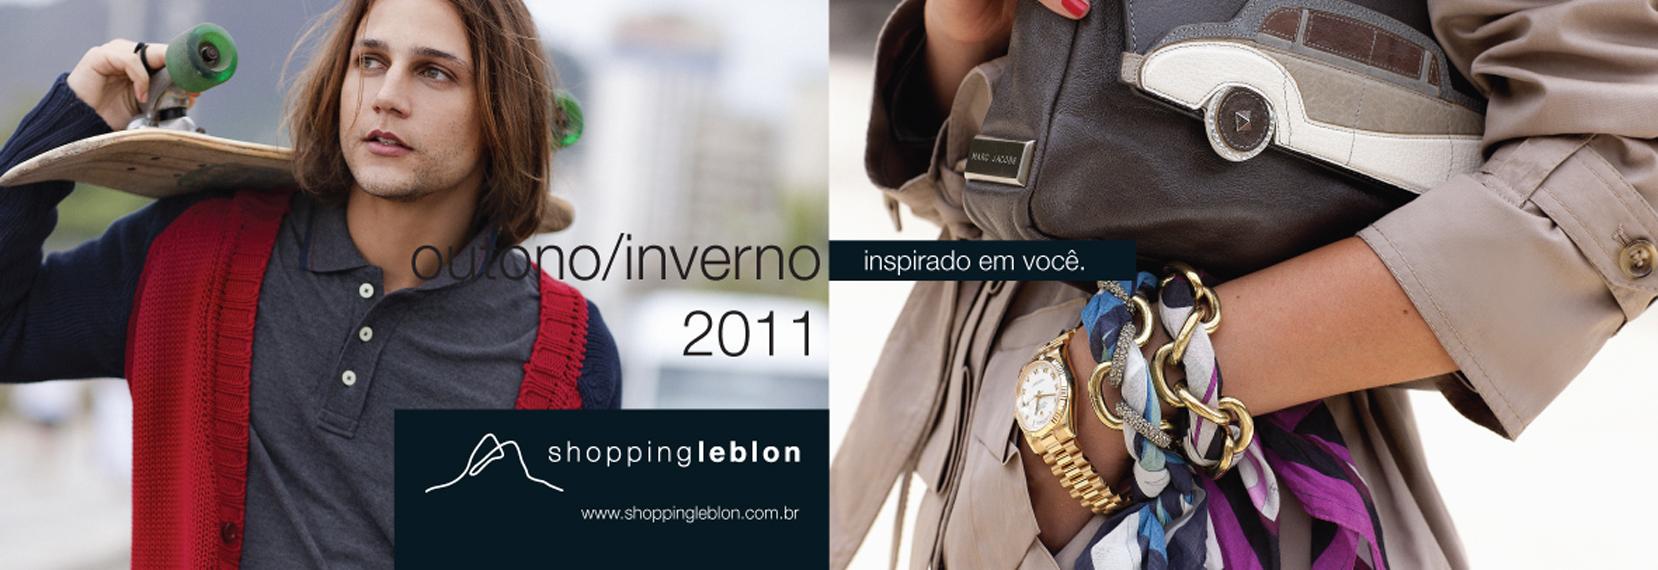 http://www.laet.com.br/site/files/gimgs/84_bancas577x185mmfinal02.jpg